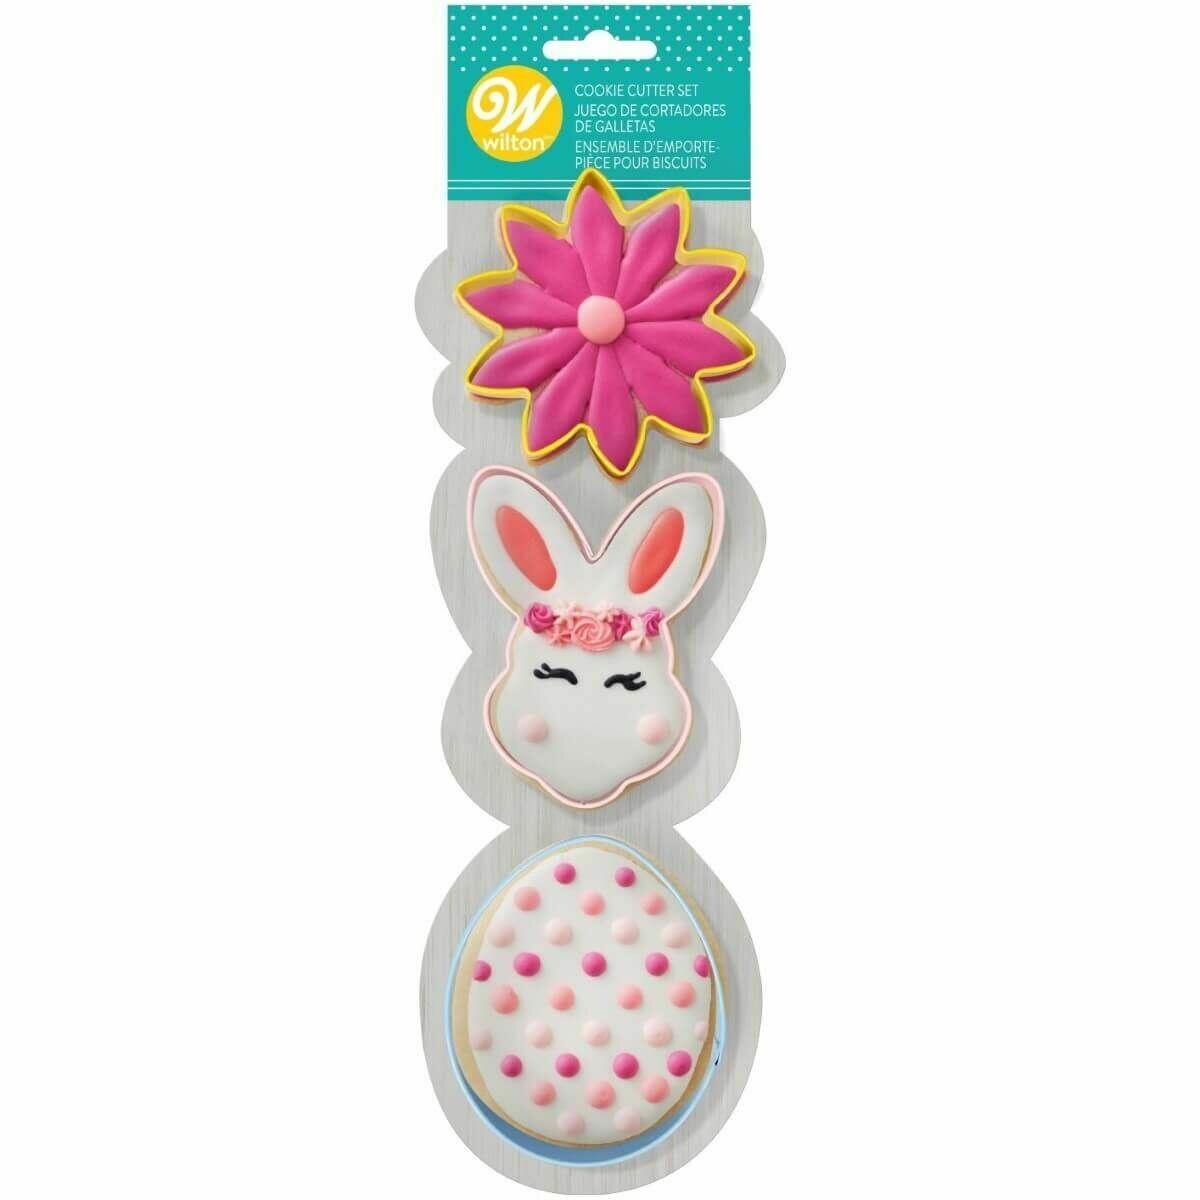 Wilton Easter Cookie Cutter Set of 3 -SPRING DESIGNS -BUNNY HEAD, EGG & FLOWER -Σετ 3τεμ  Κουπ πάτ με Ανοιξιάτικο θέμα